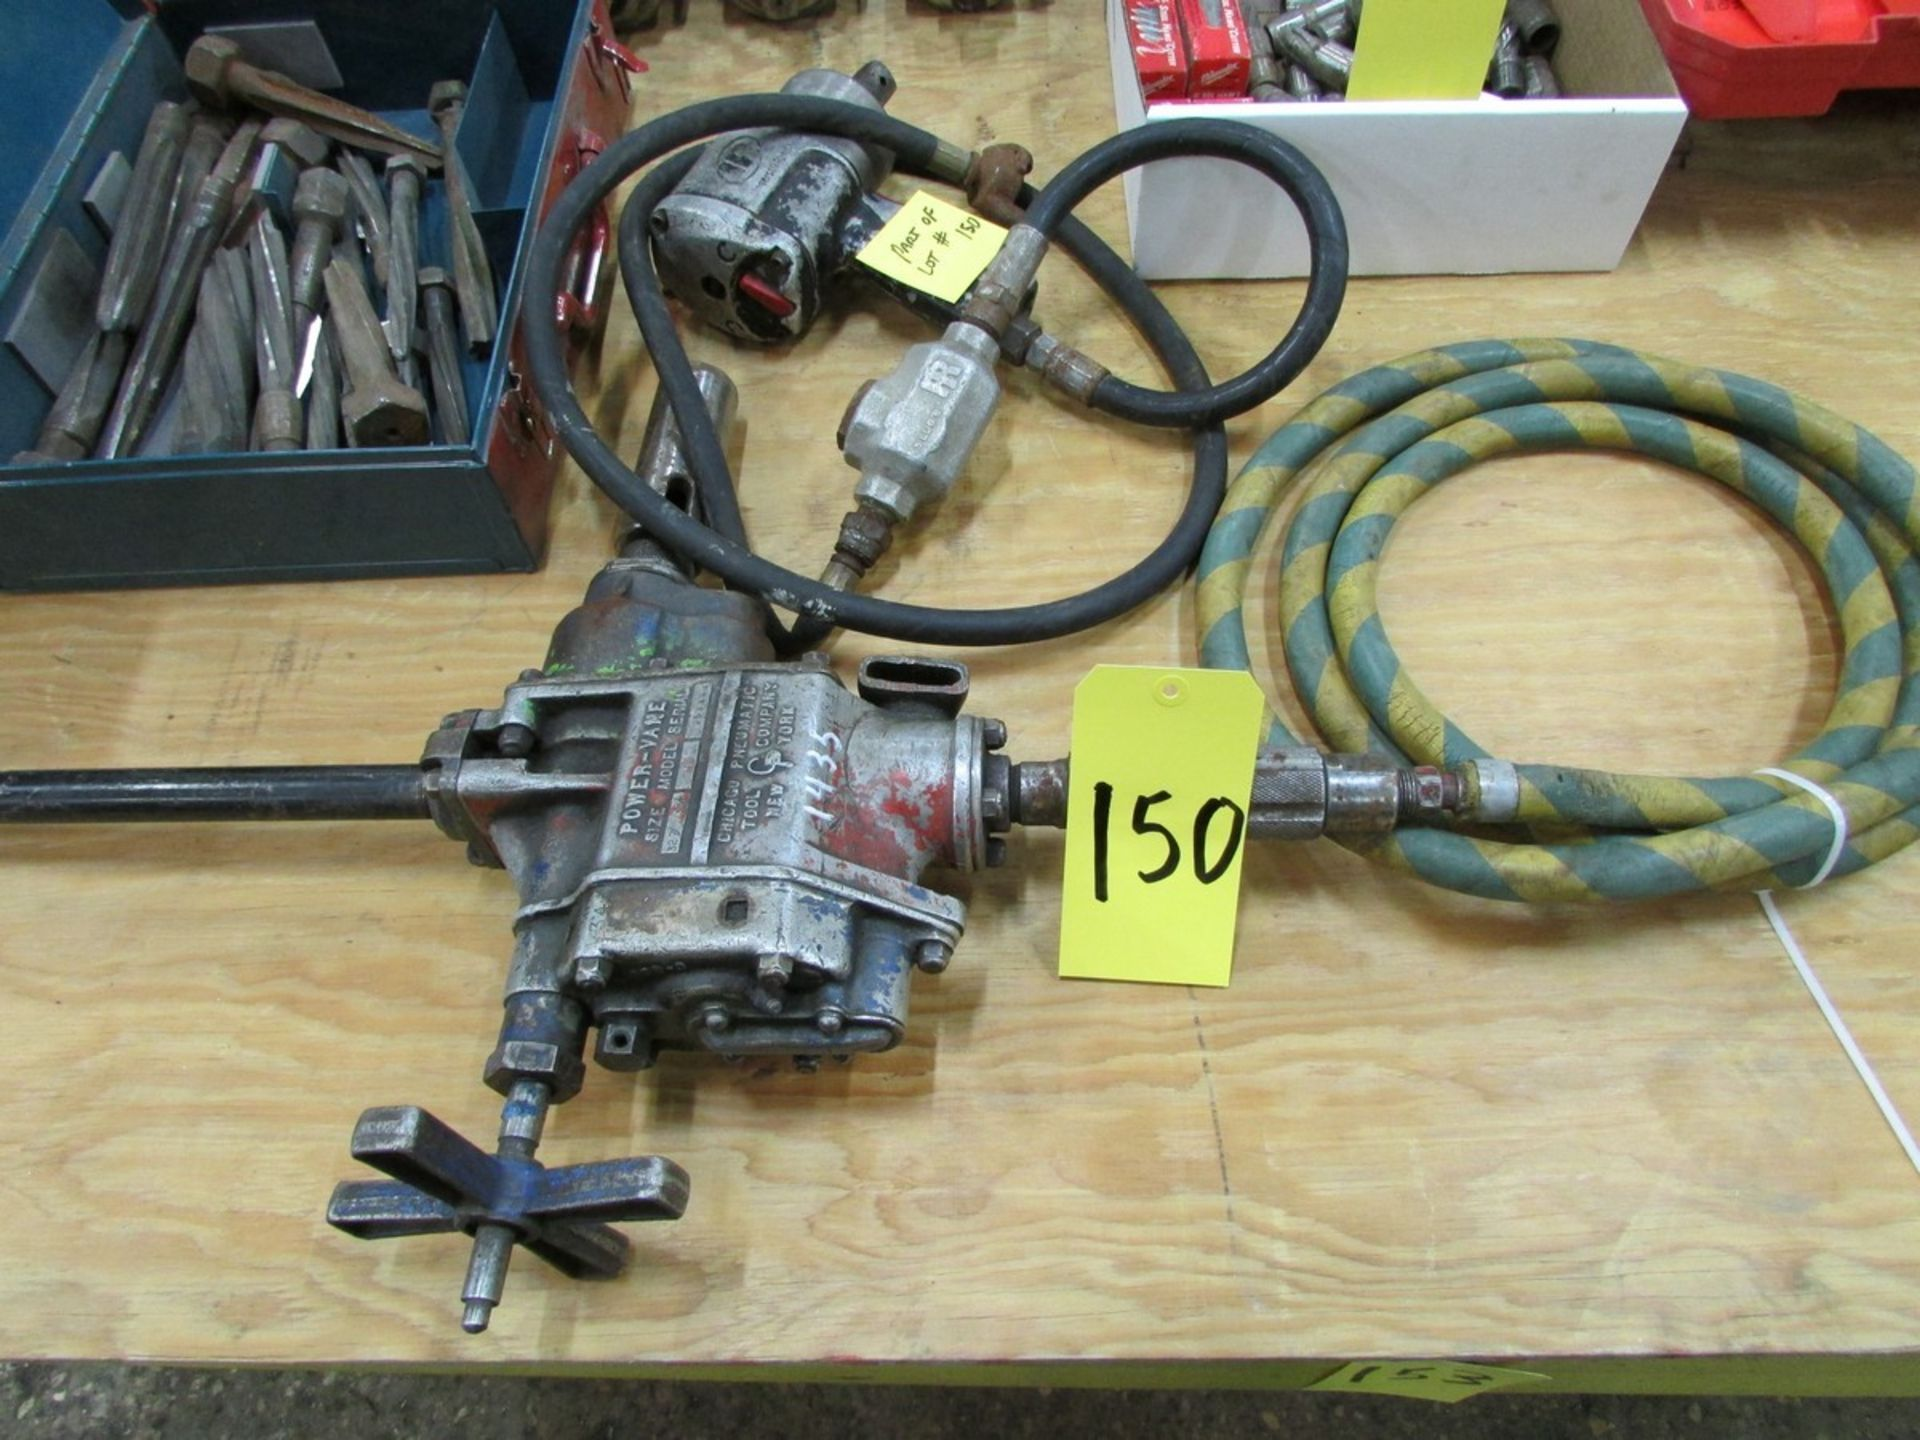 Lot 150 - Chicago Pnuematics Power Vane HD pnuematic drill, s/n 20336M w/ 4MT & Ingersol Rand impact driver